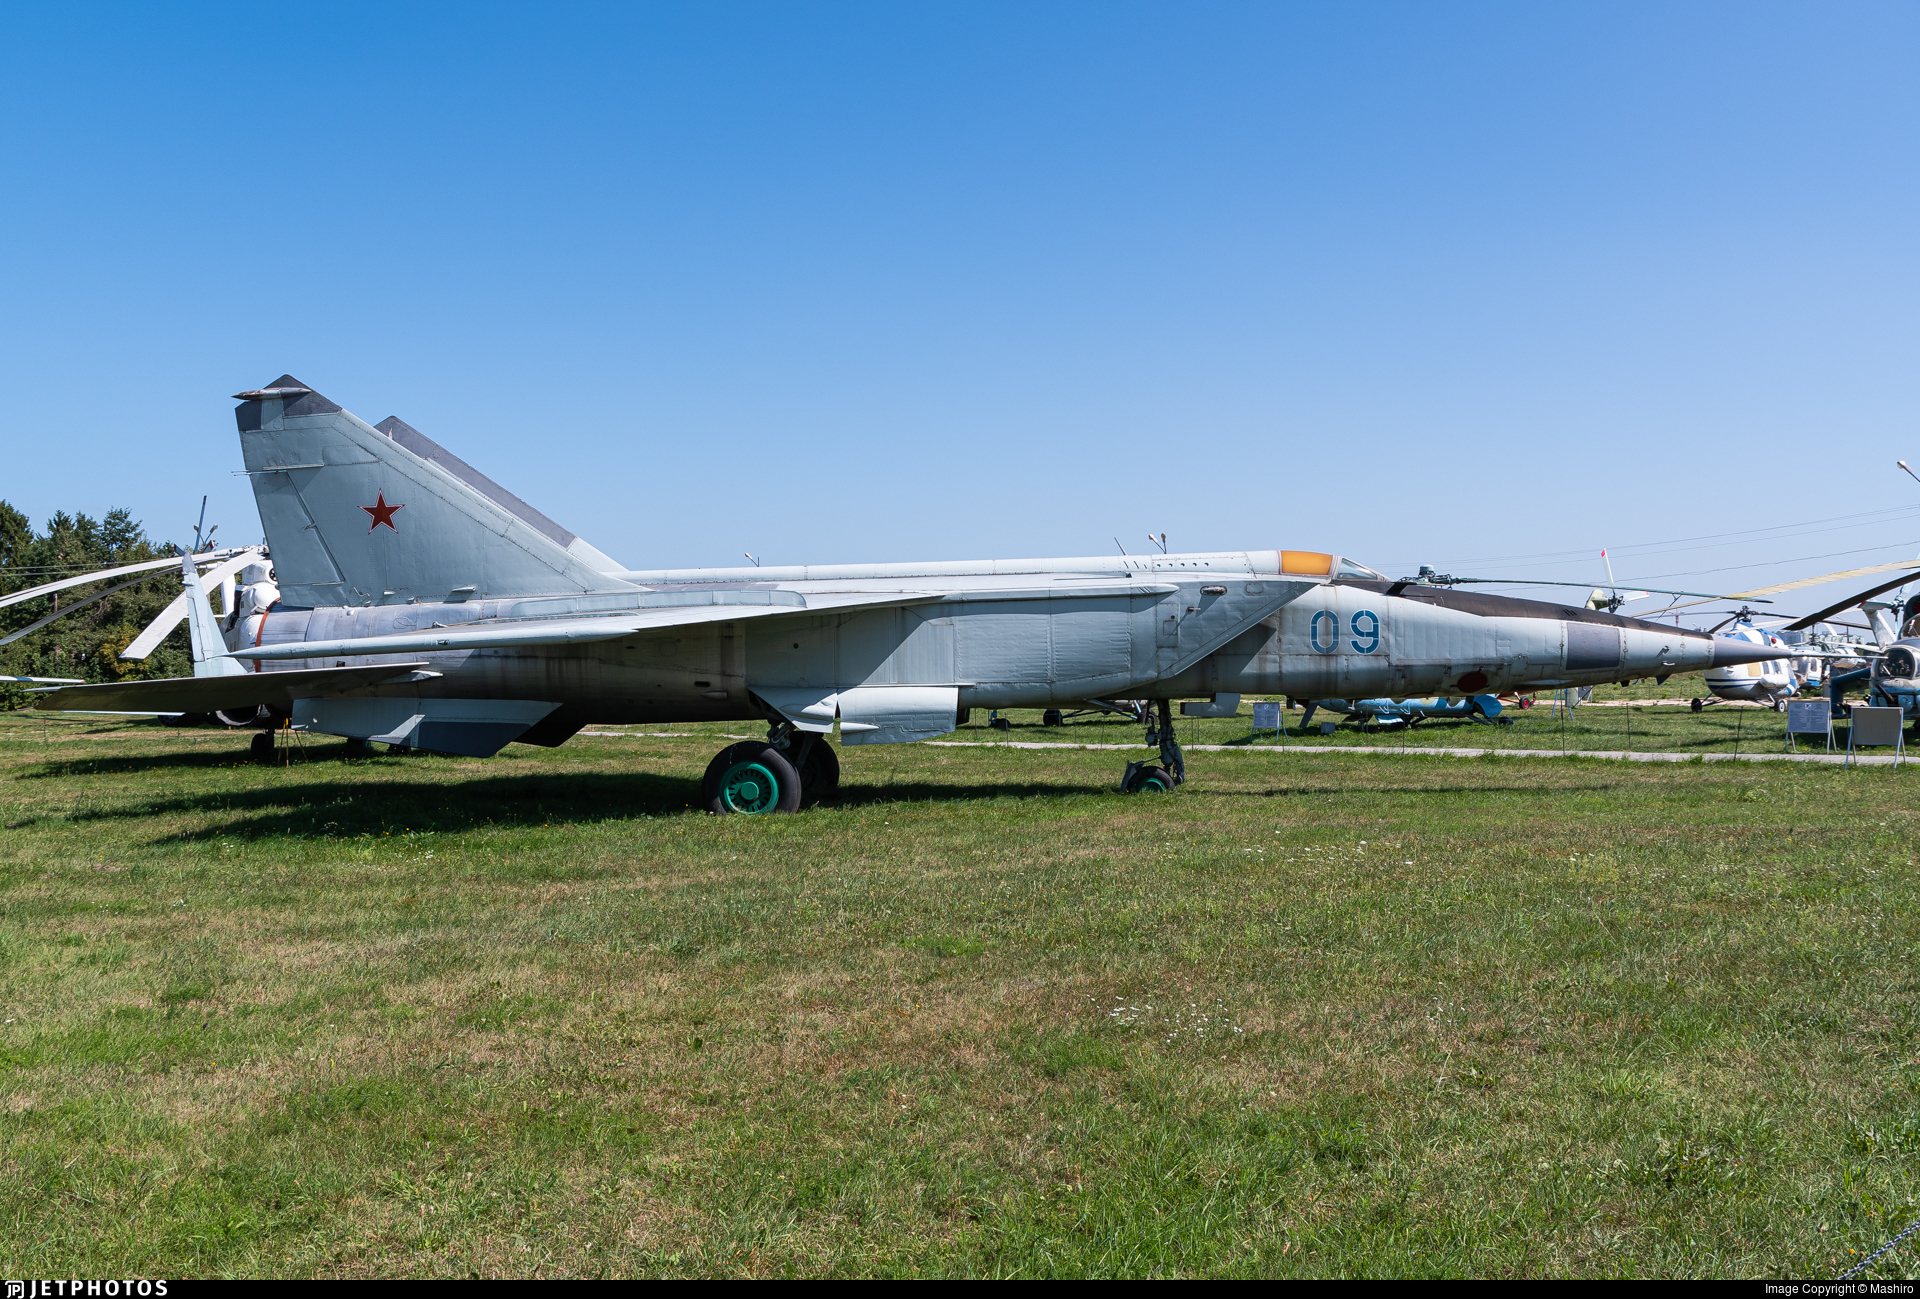 09 - Mikoyan-Gurevich MiG-25 Foxbat - Soviet Union - Air Force